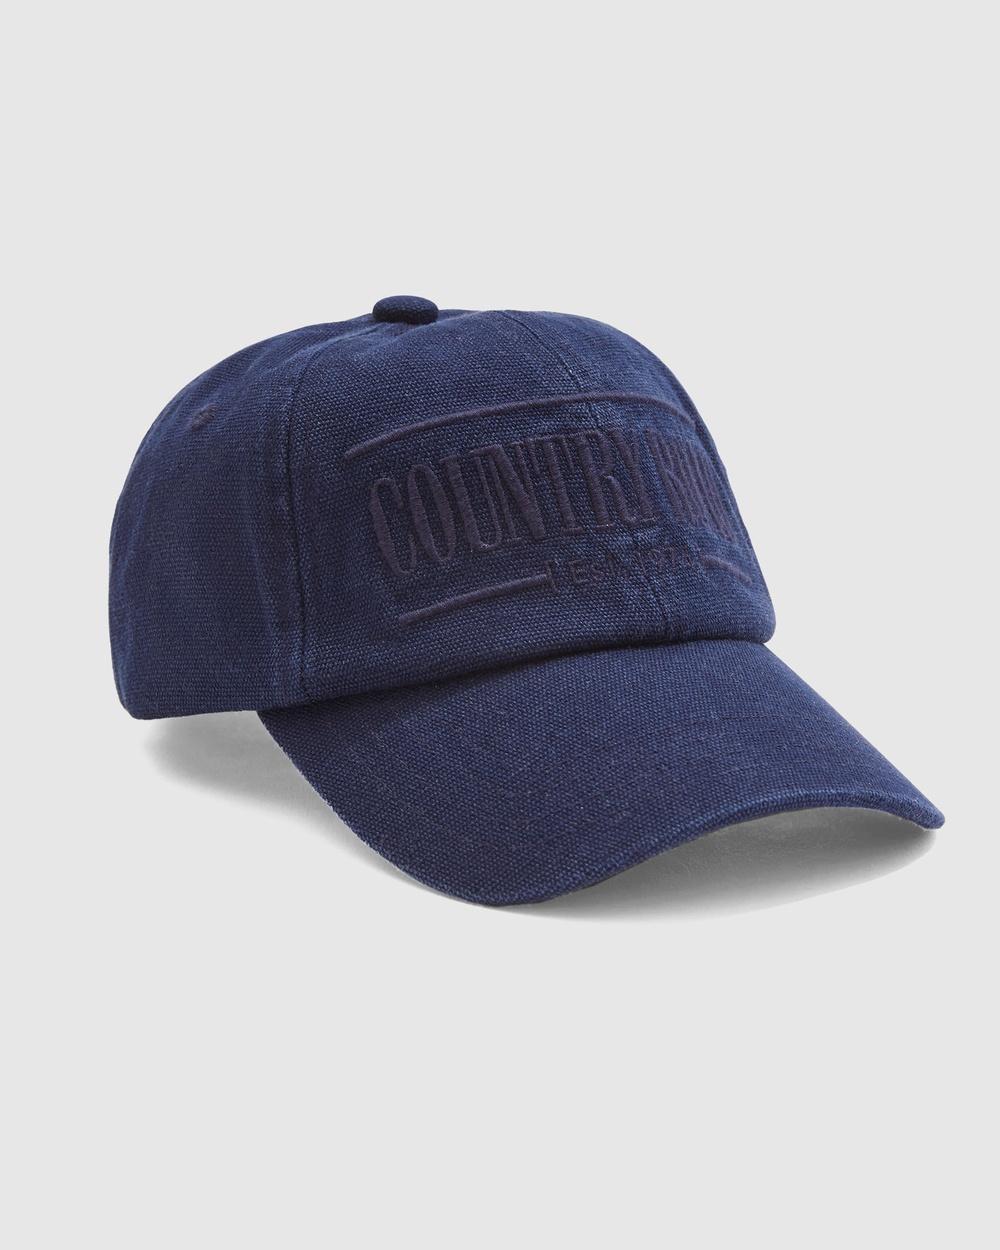 Country Road Heritage Cap Headwear navy